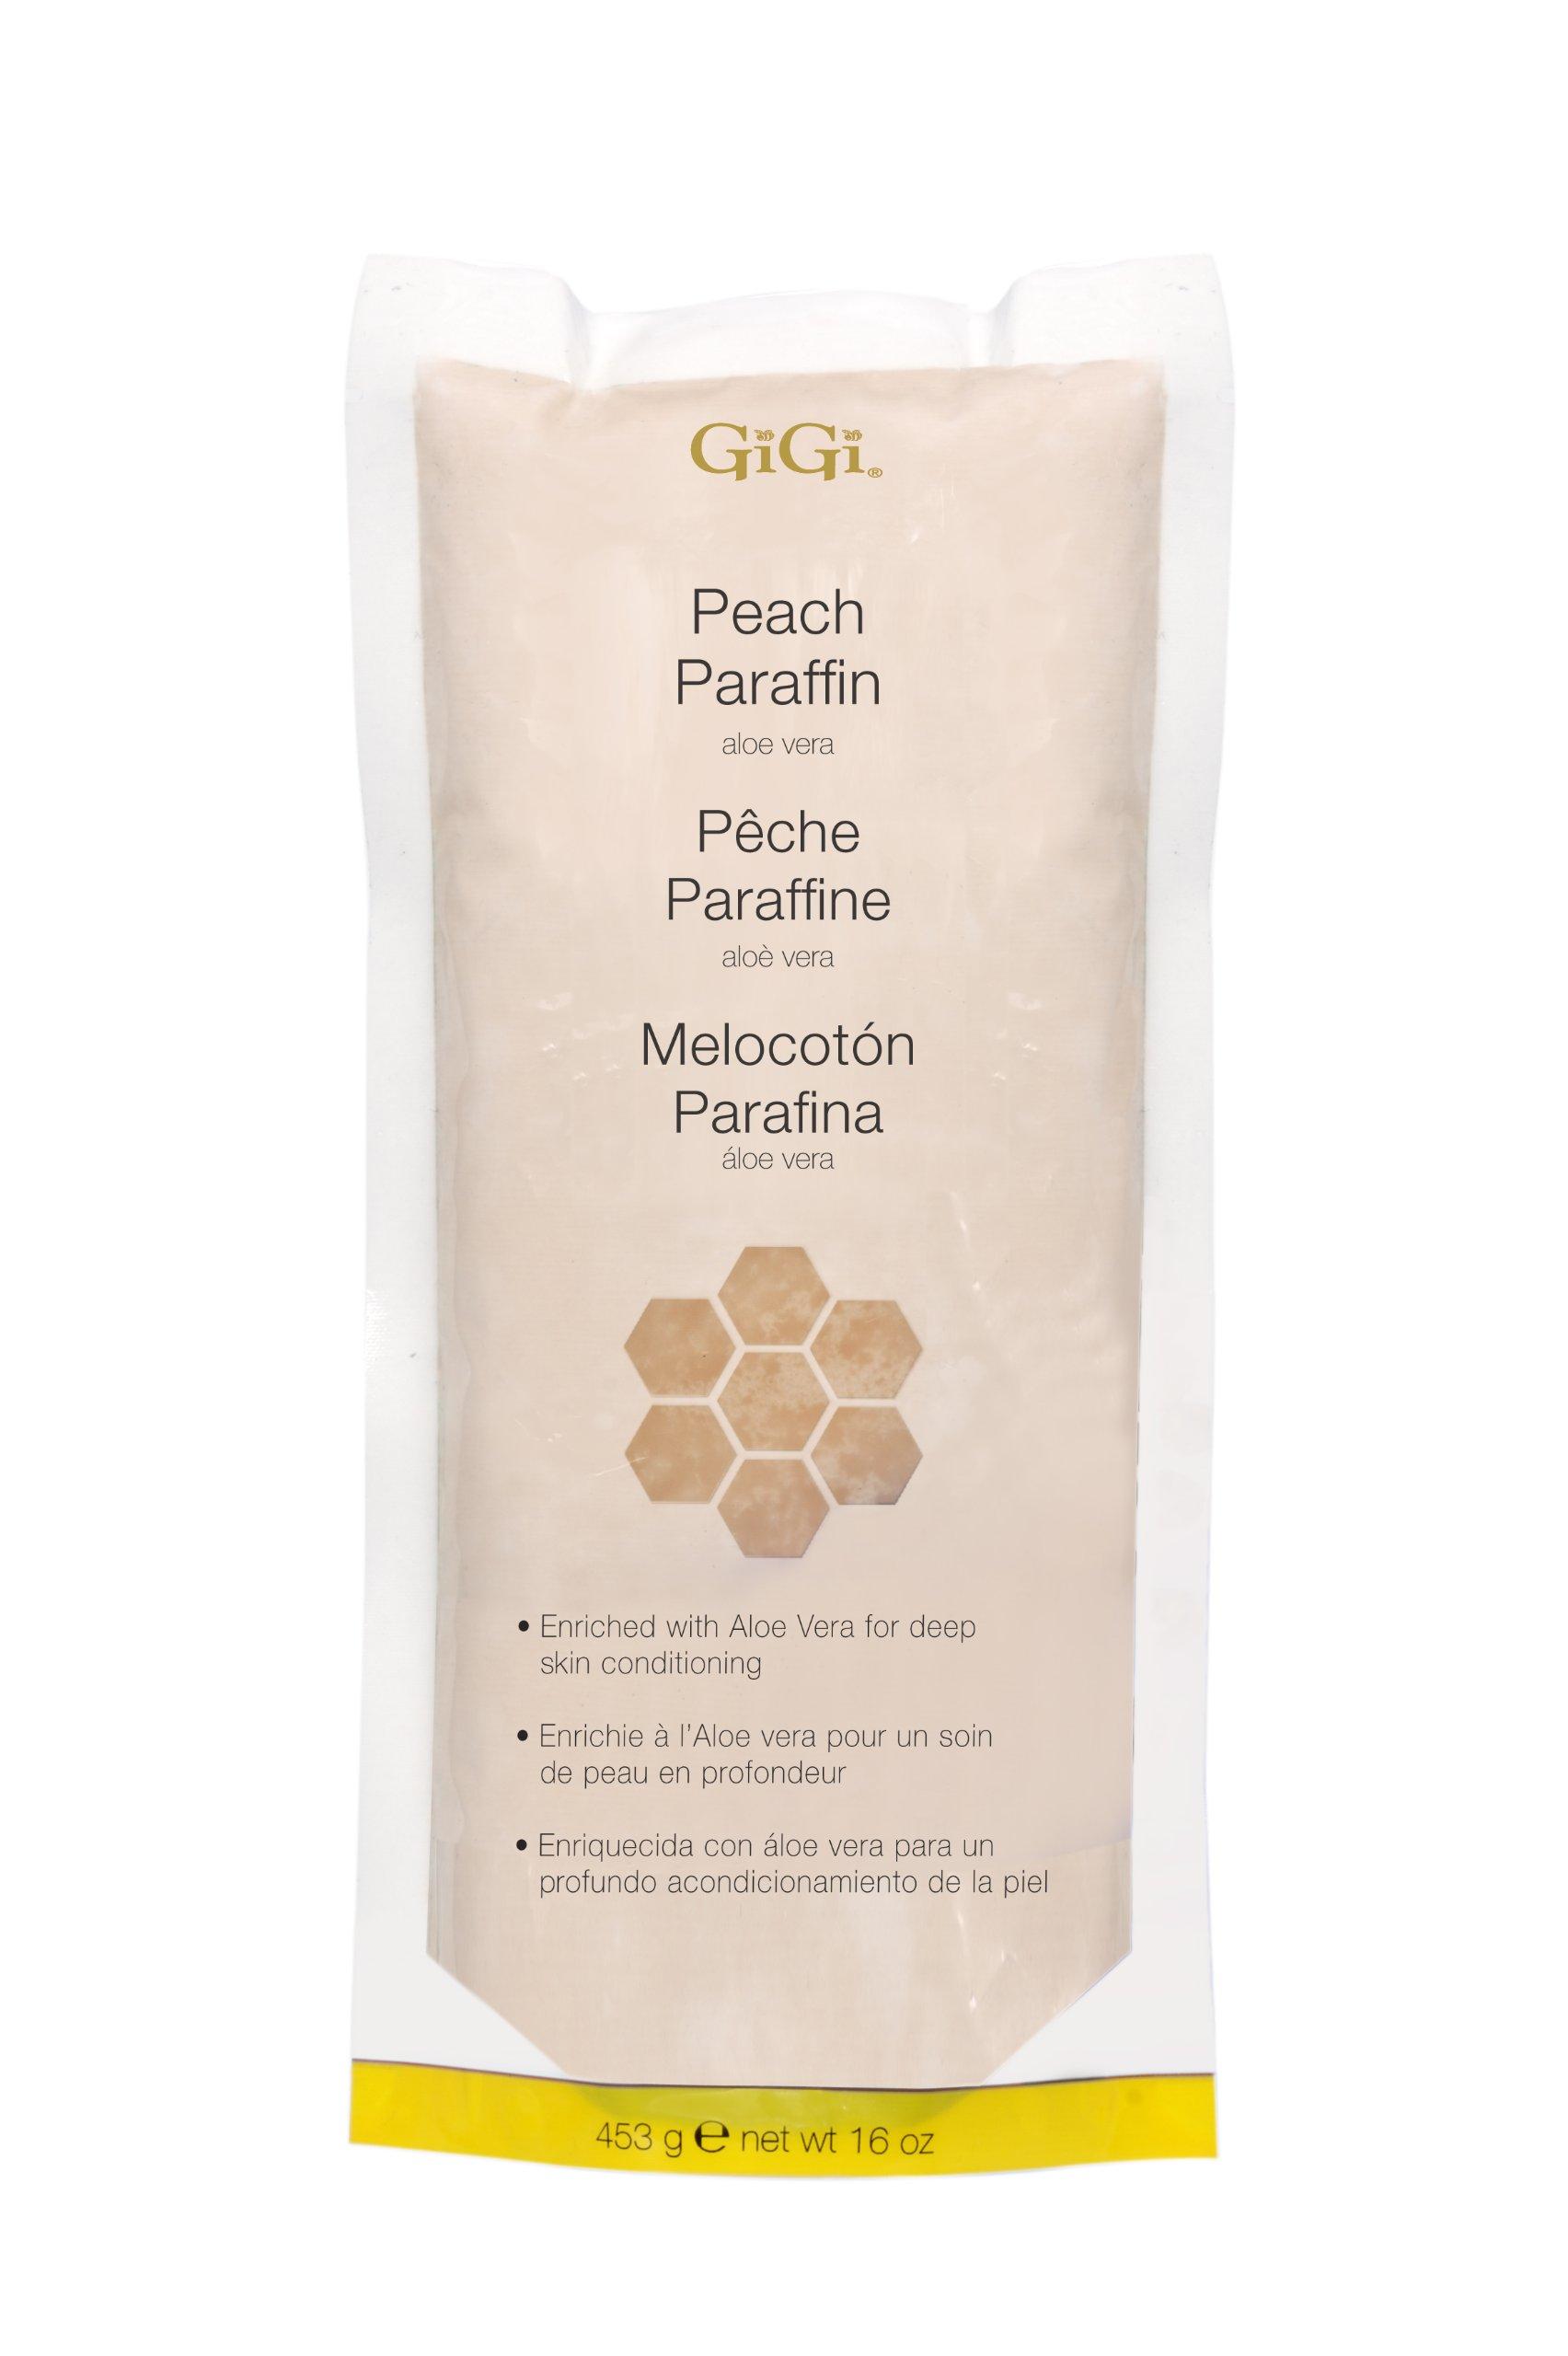 GIGI Peach Paraffin Wax With Aloe Vera by GiGi